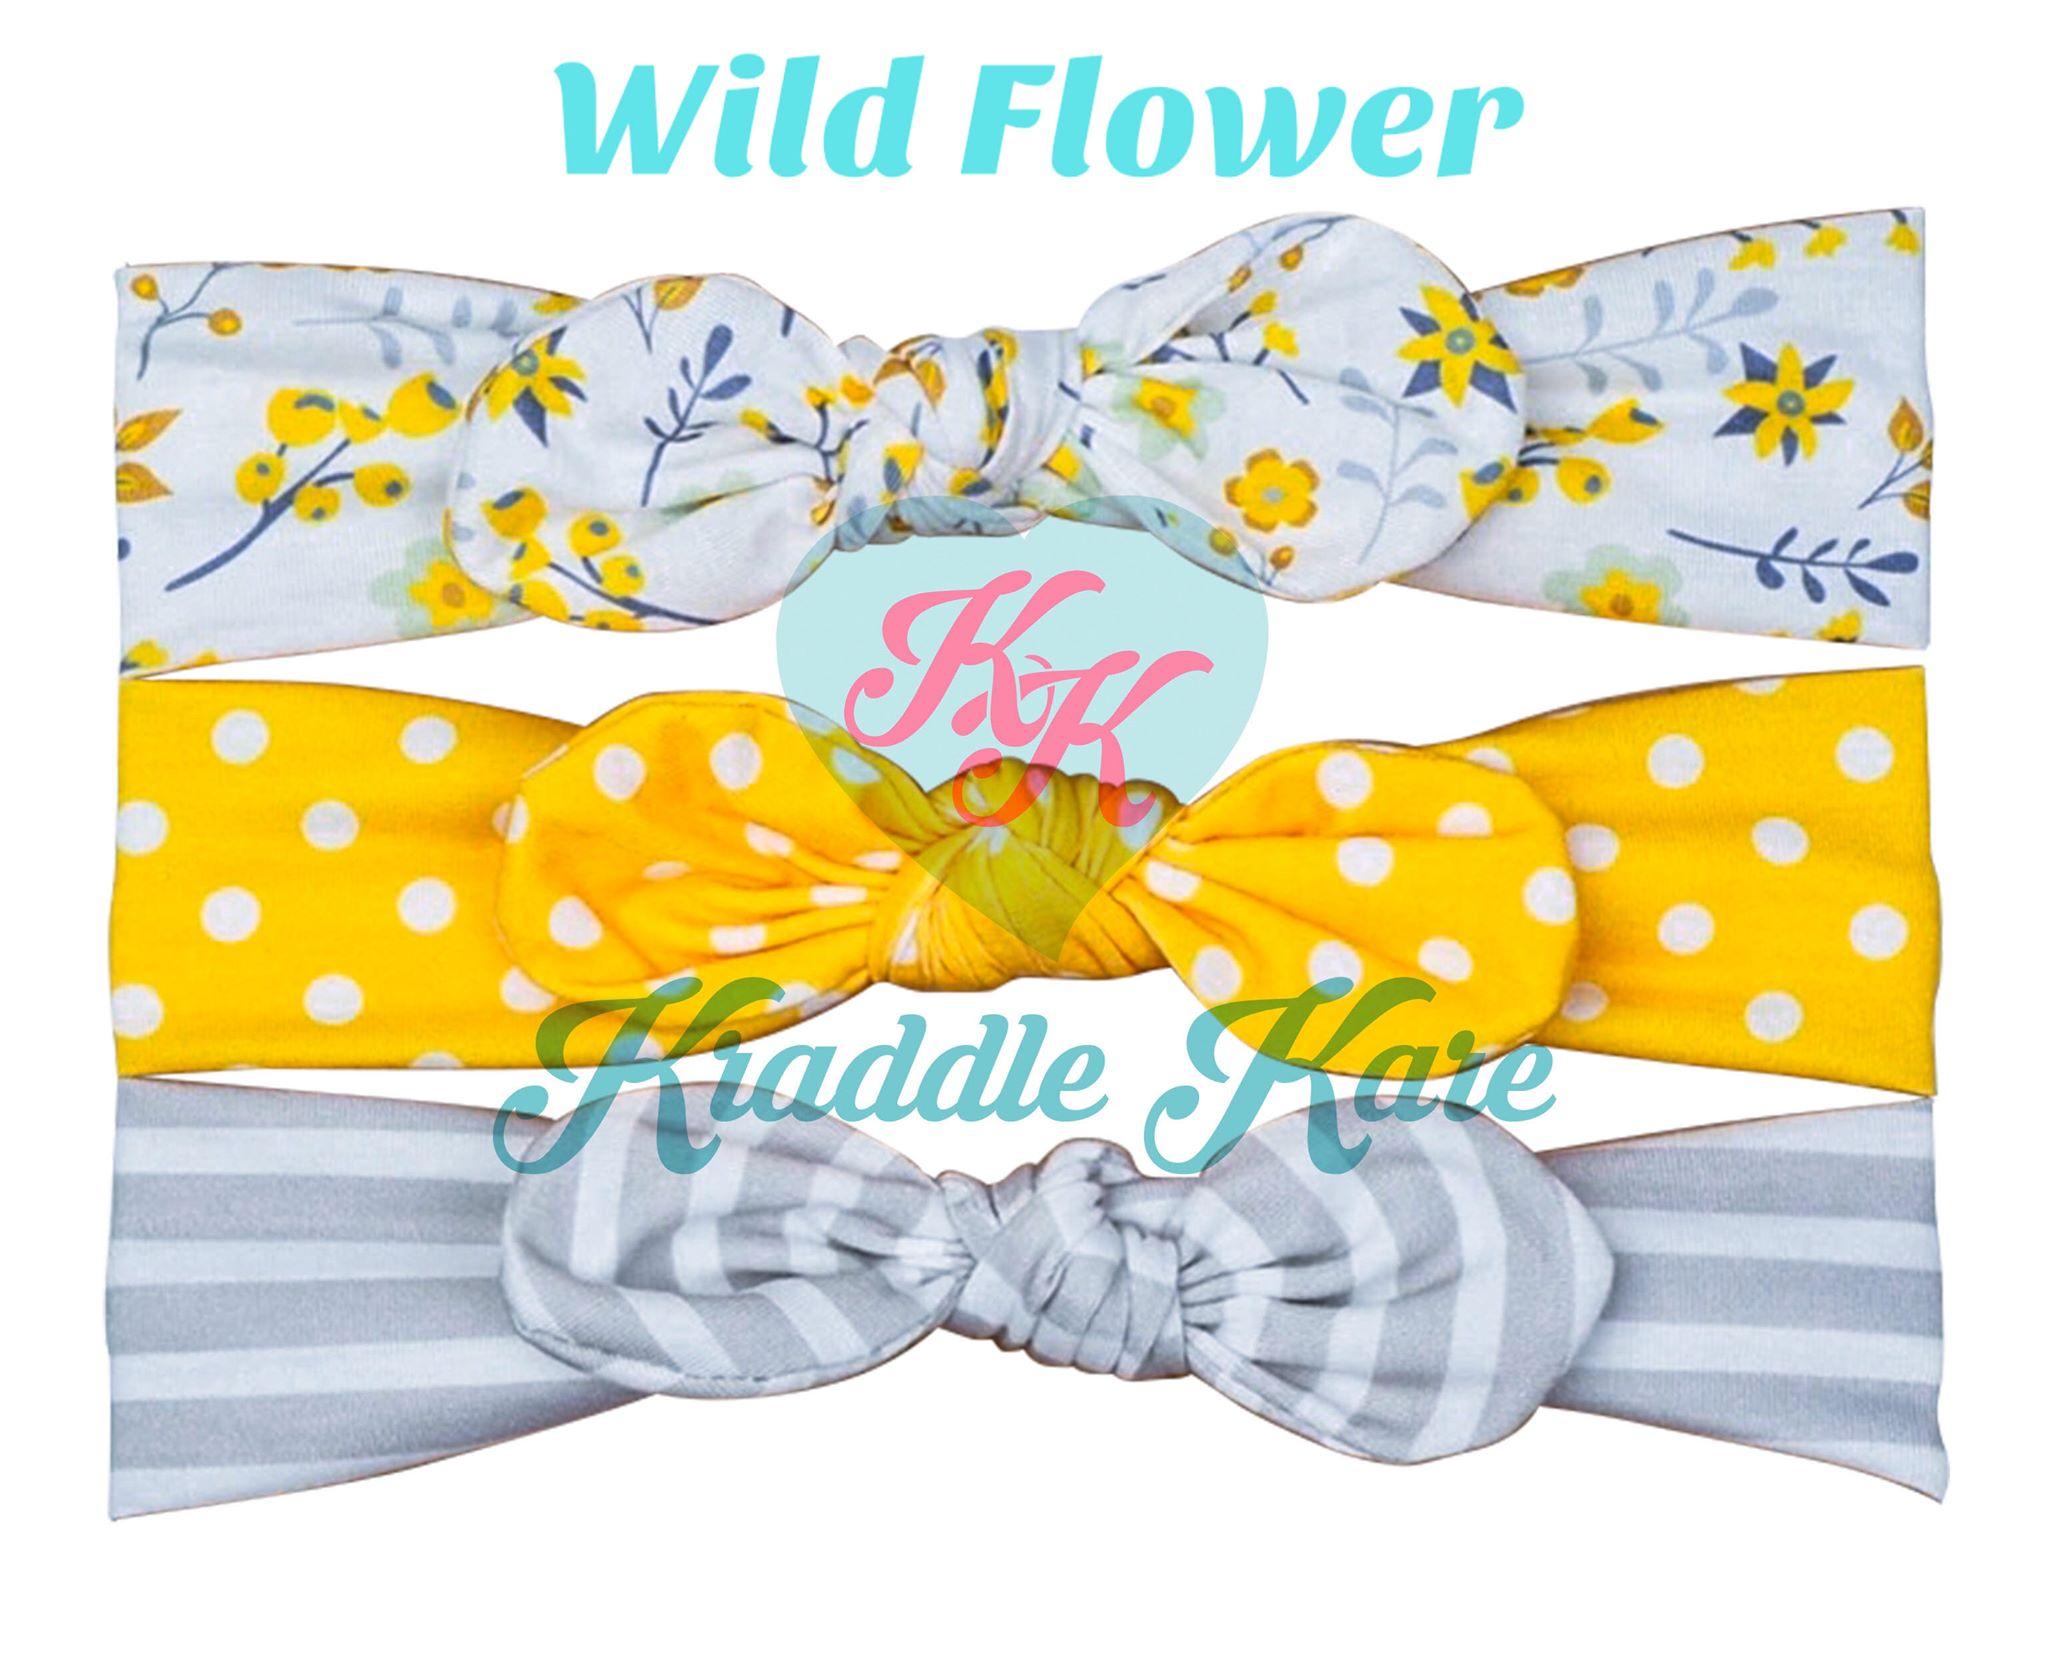 Kraddle Kare | raibandz-wild-flower